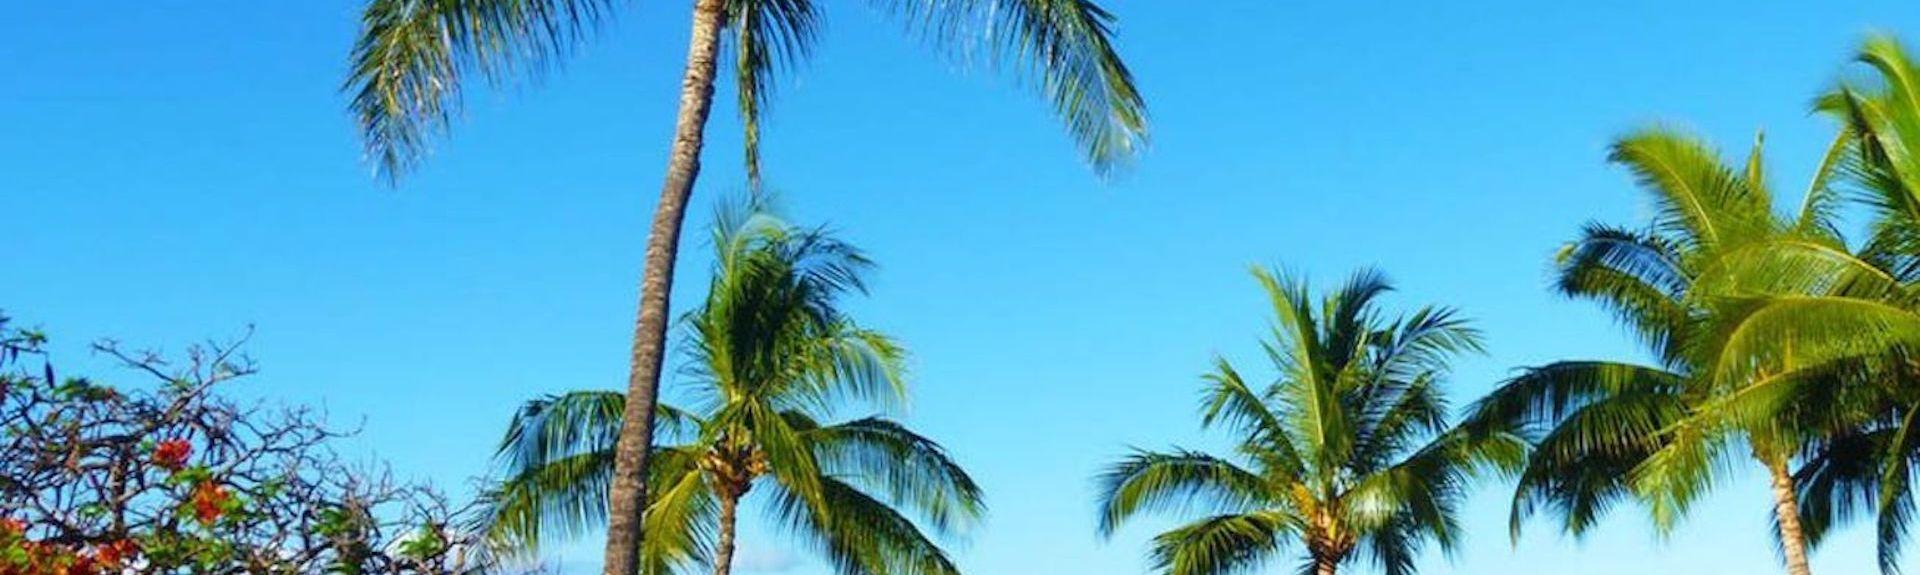 Lahaina Shores Beach Resort, Lahaina, Hawaii, United States of America